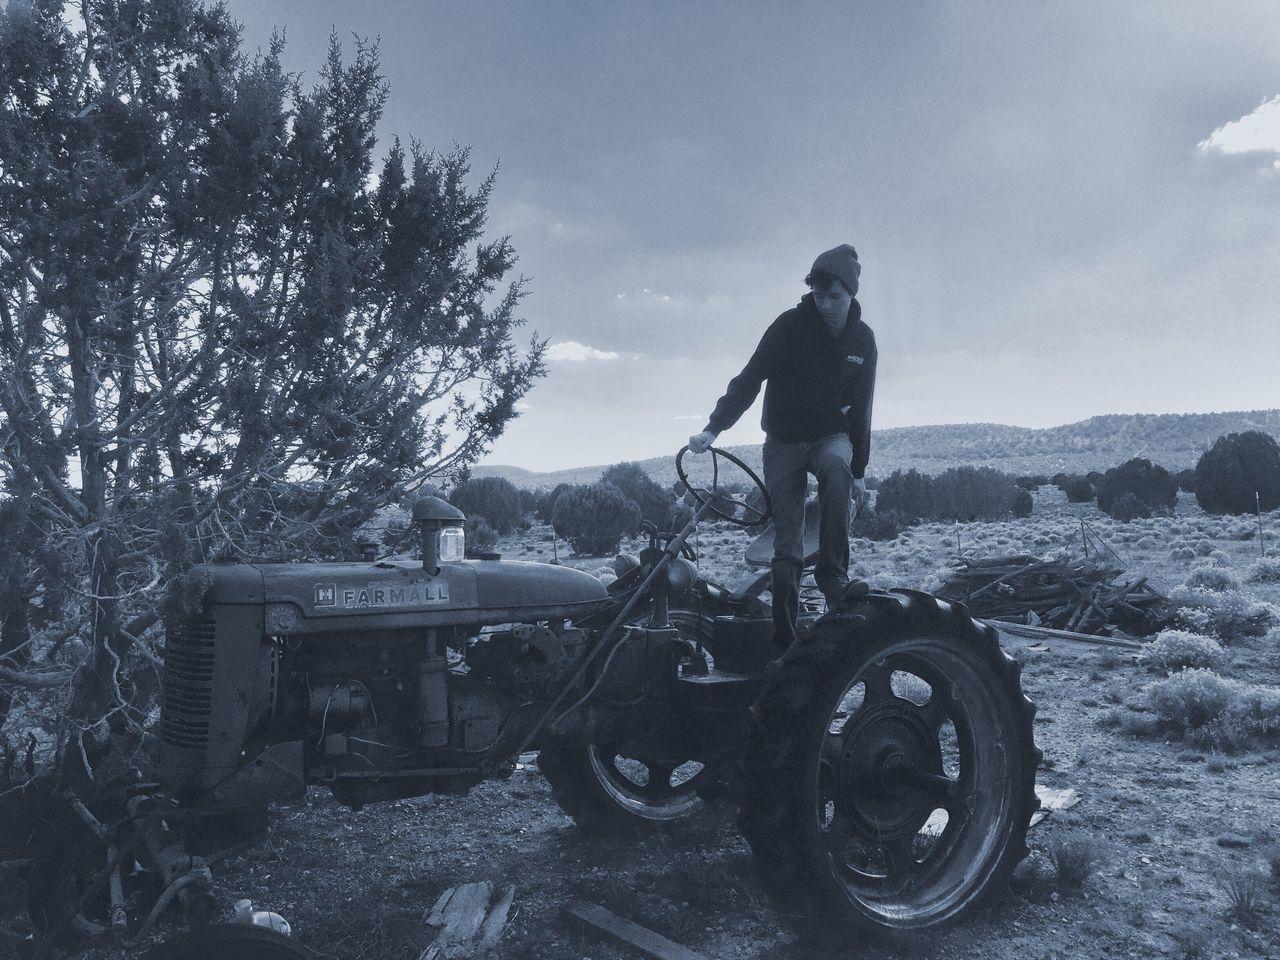 Monochrome Photography Fade To Black Arizona Desert Rusty Autos -cinereal tones and granite skies